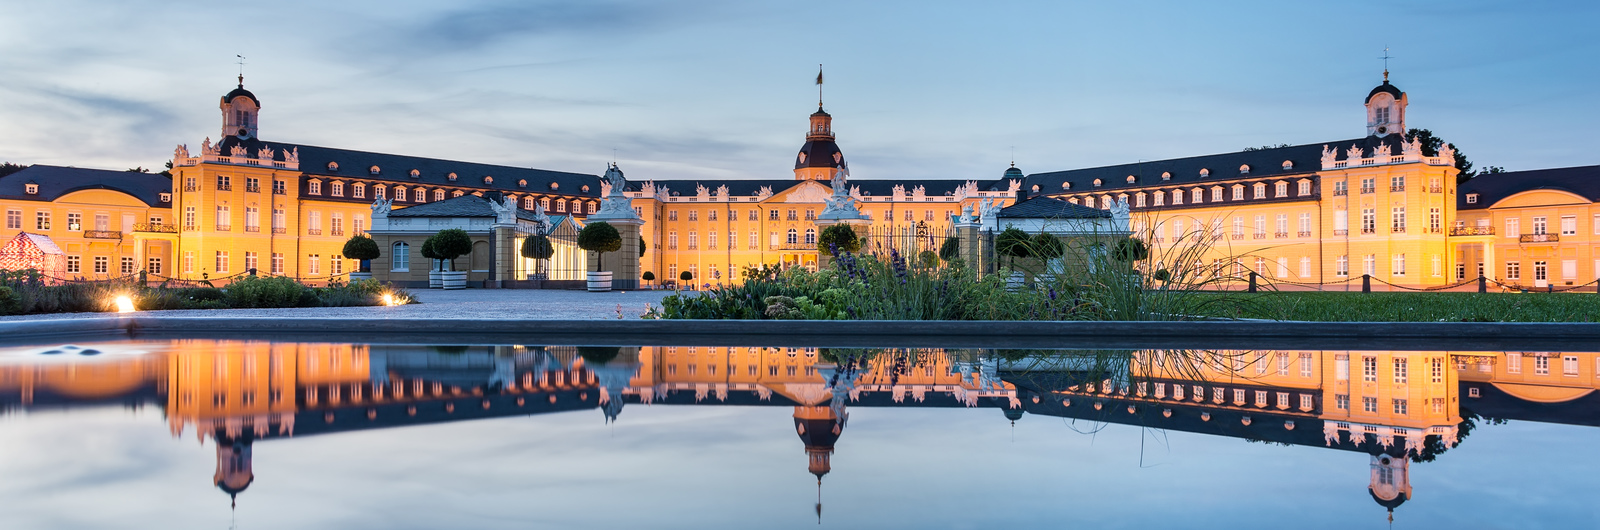 karlsruhe city header1